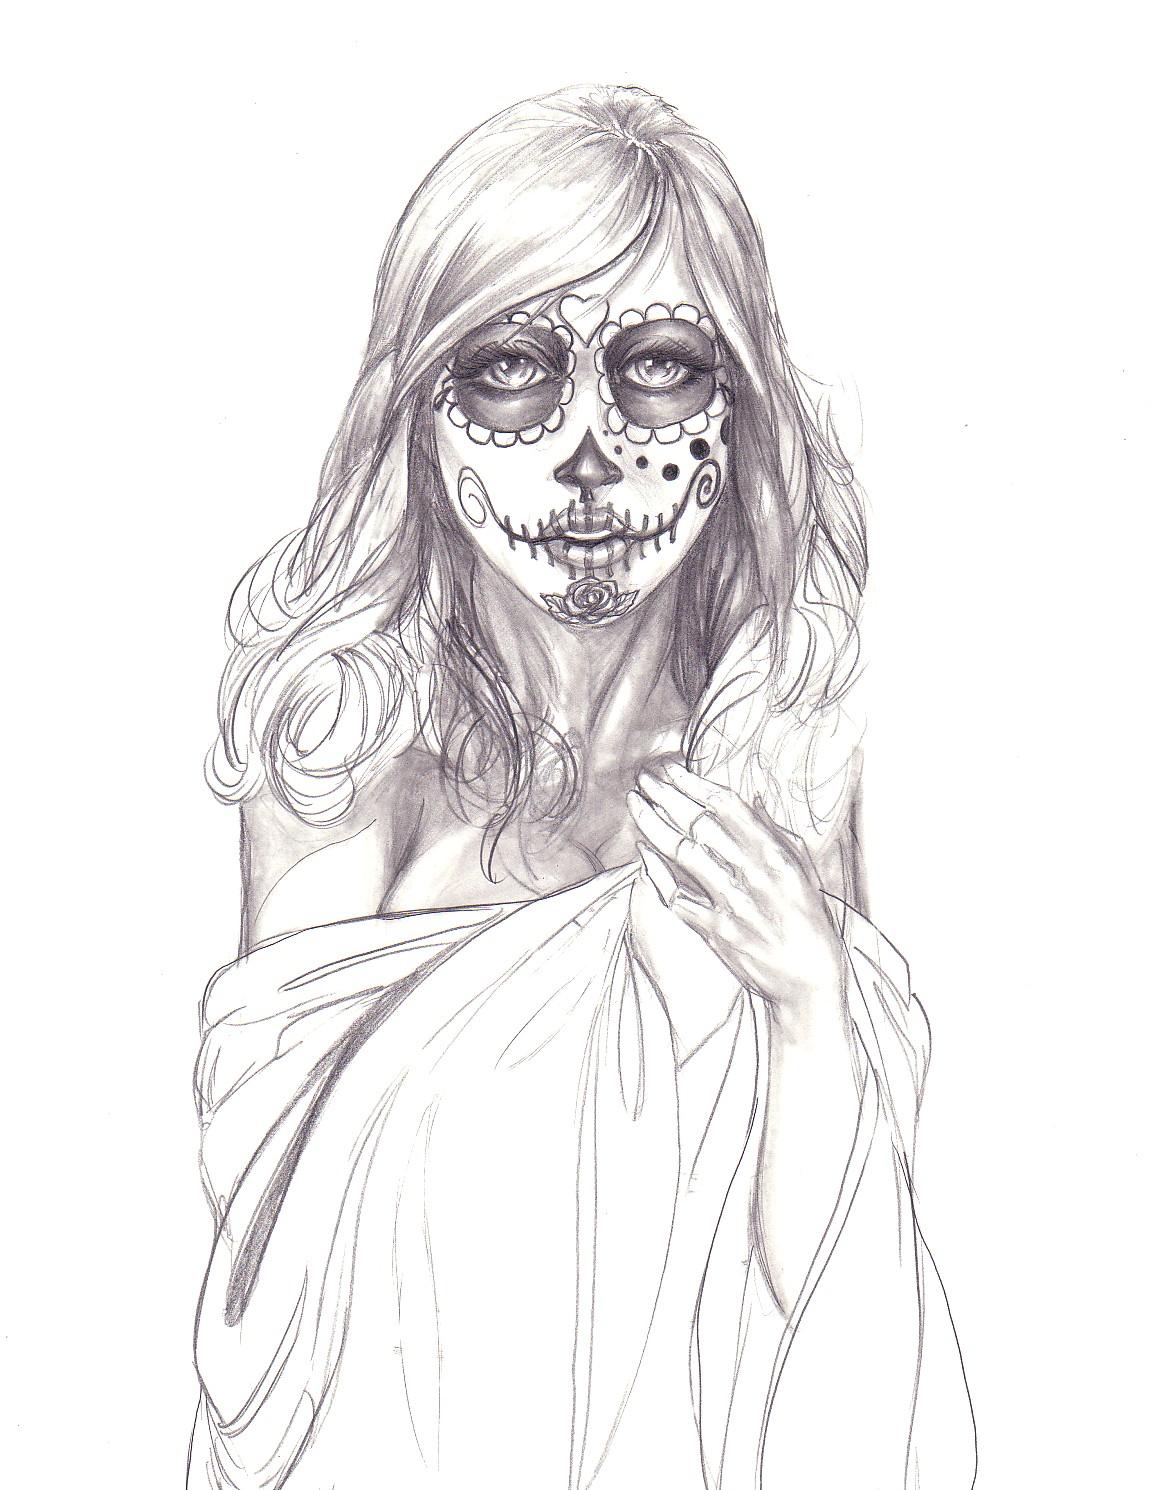 Drawn skull female skull Sugar and Sugar girl Drawing